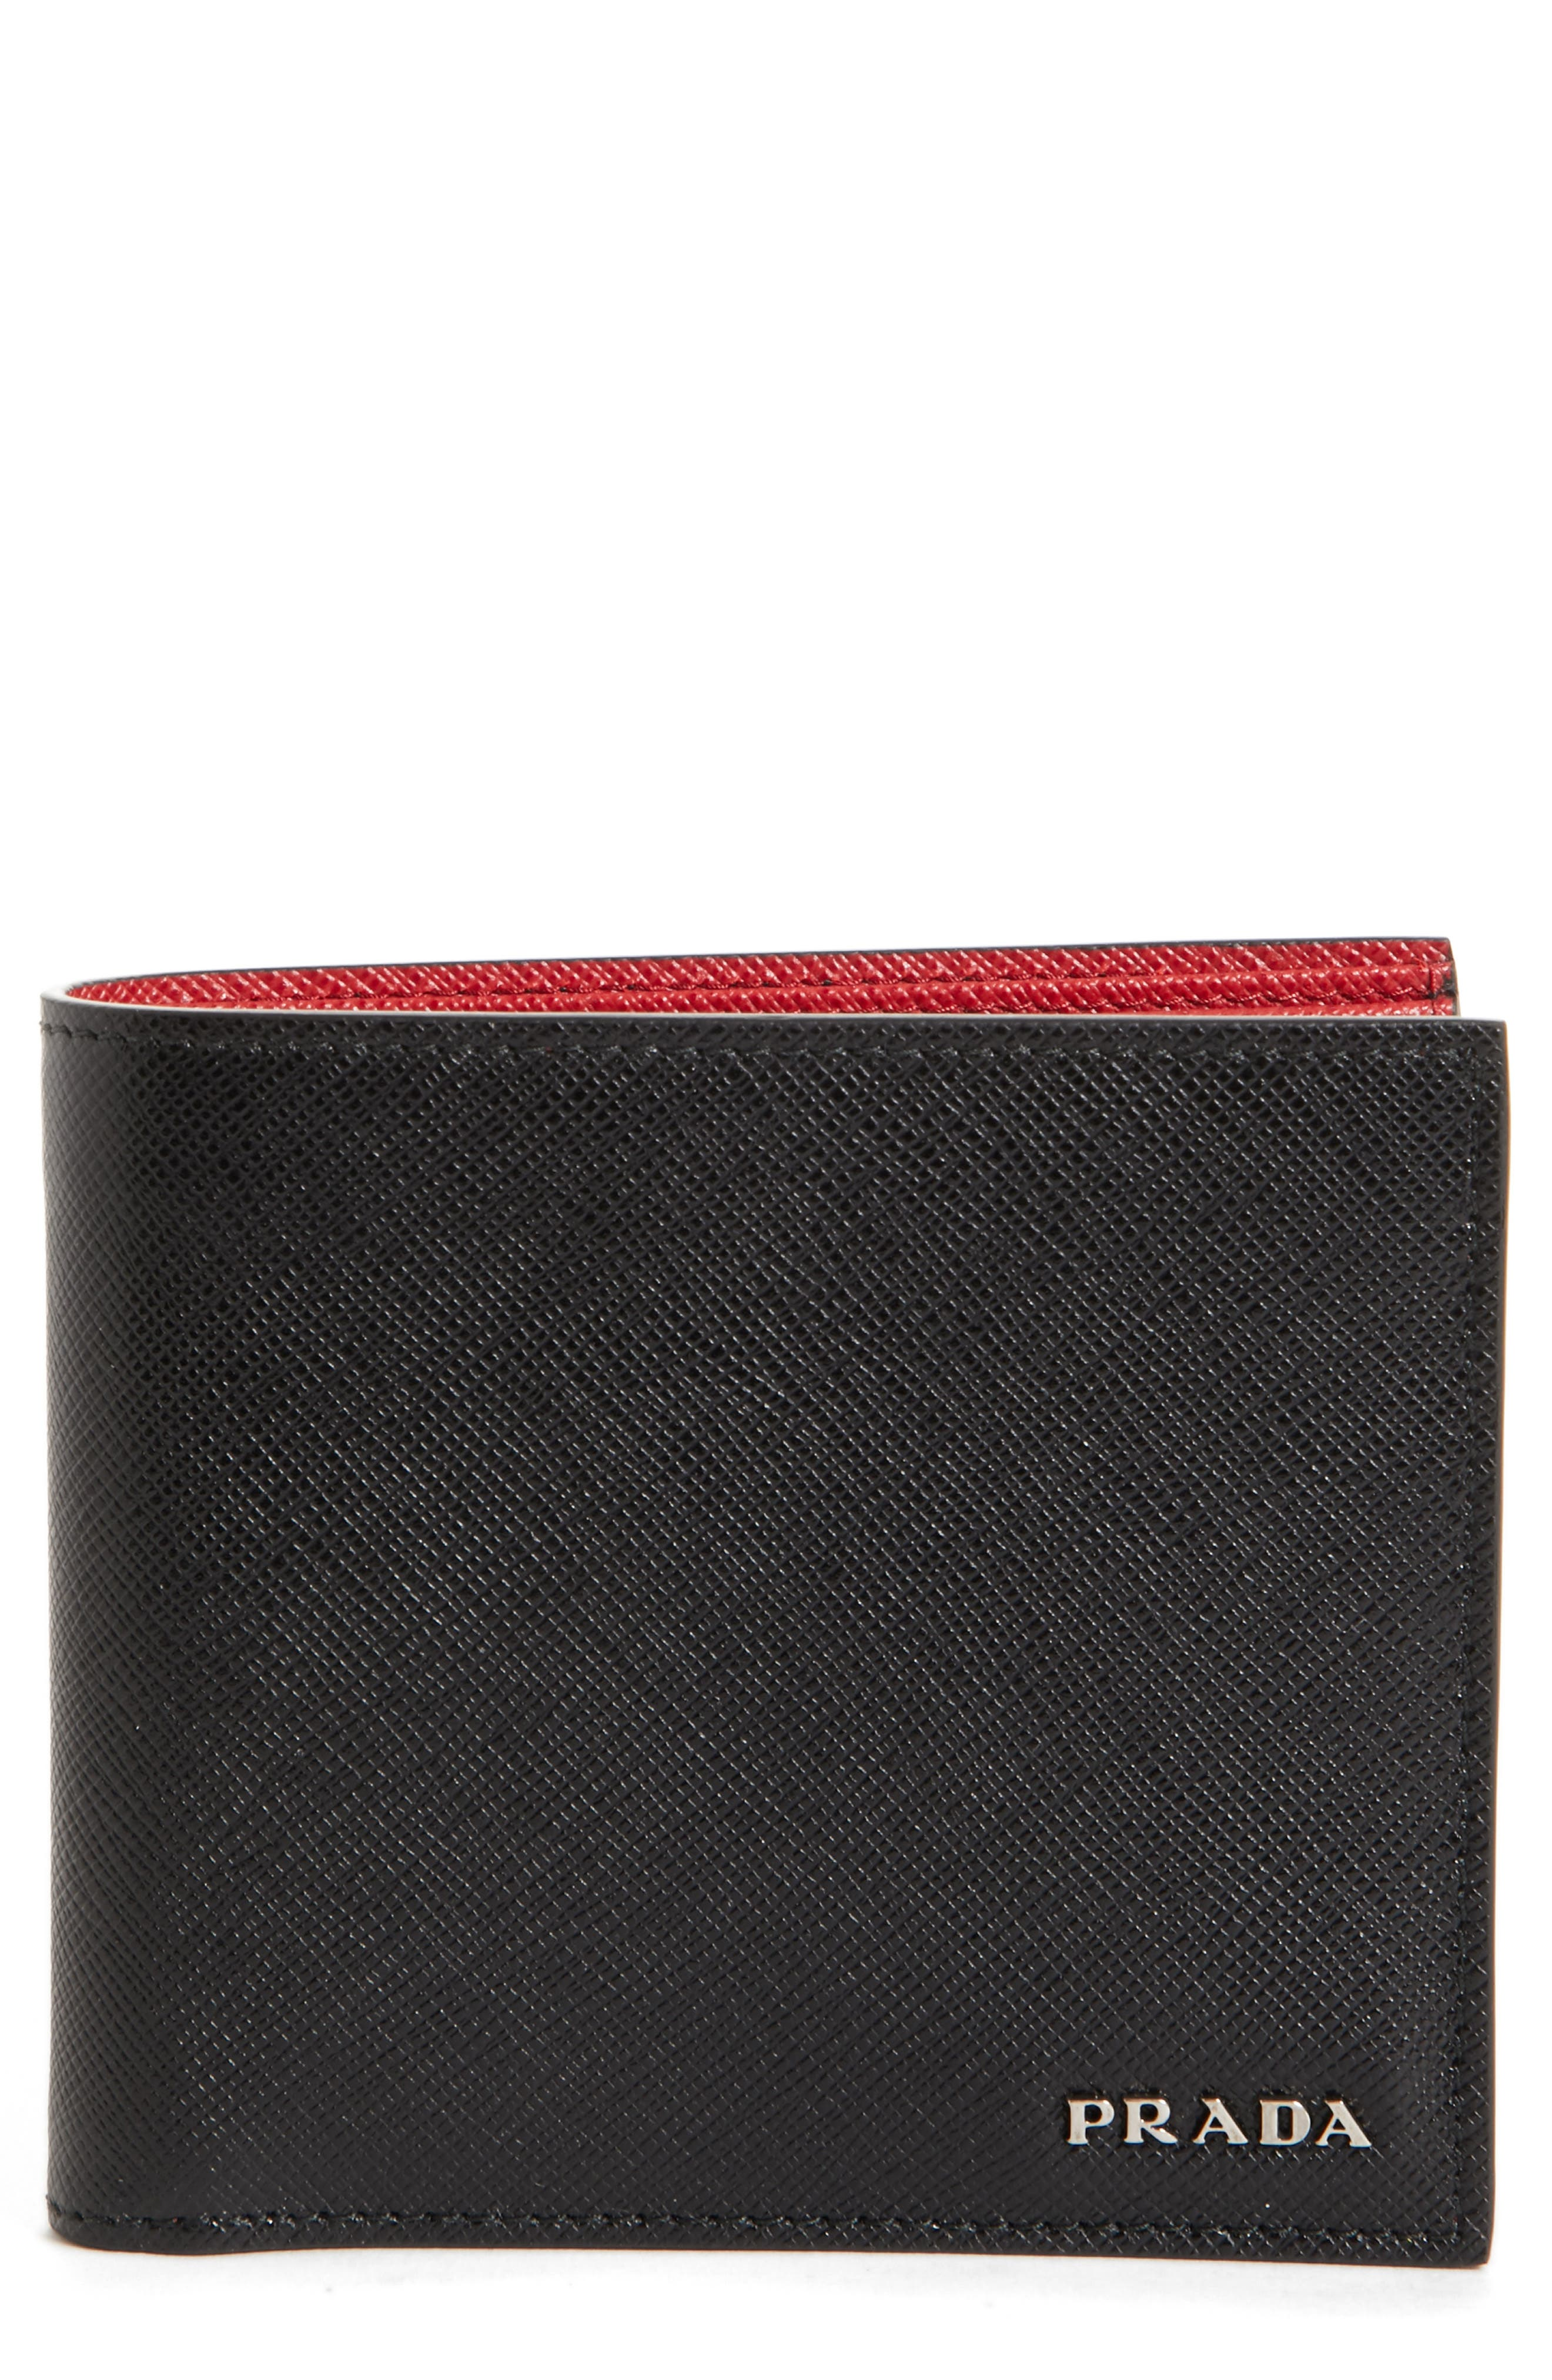 Bicolor Leather Wallet,                         Main,                         color, 001